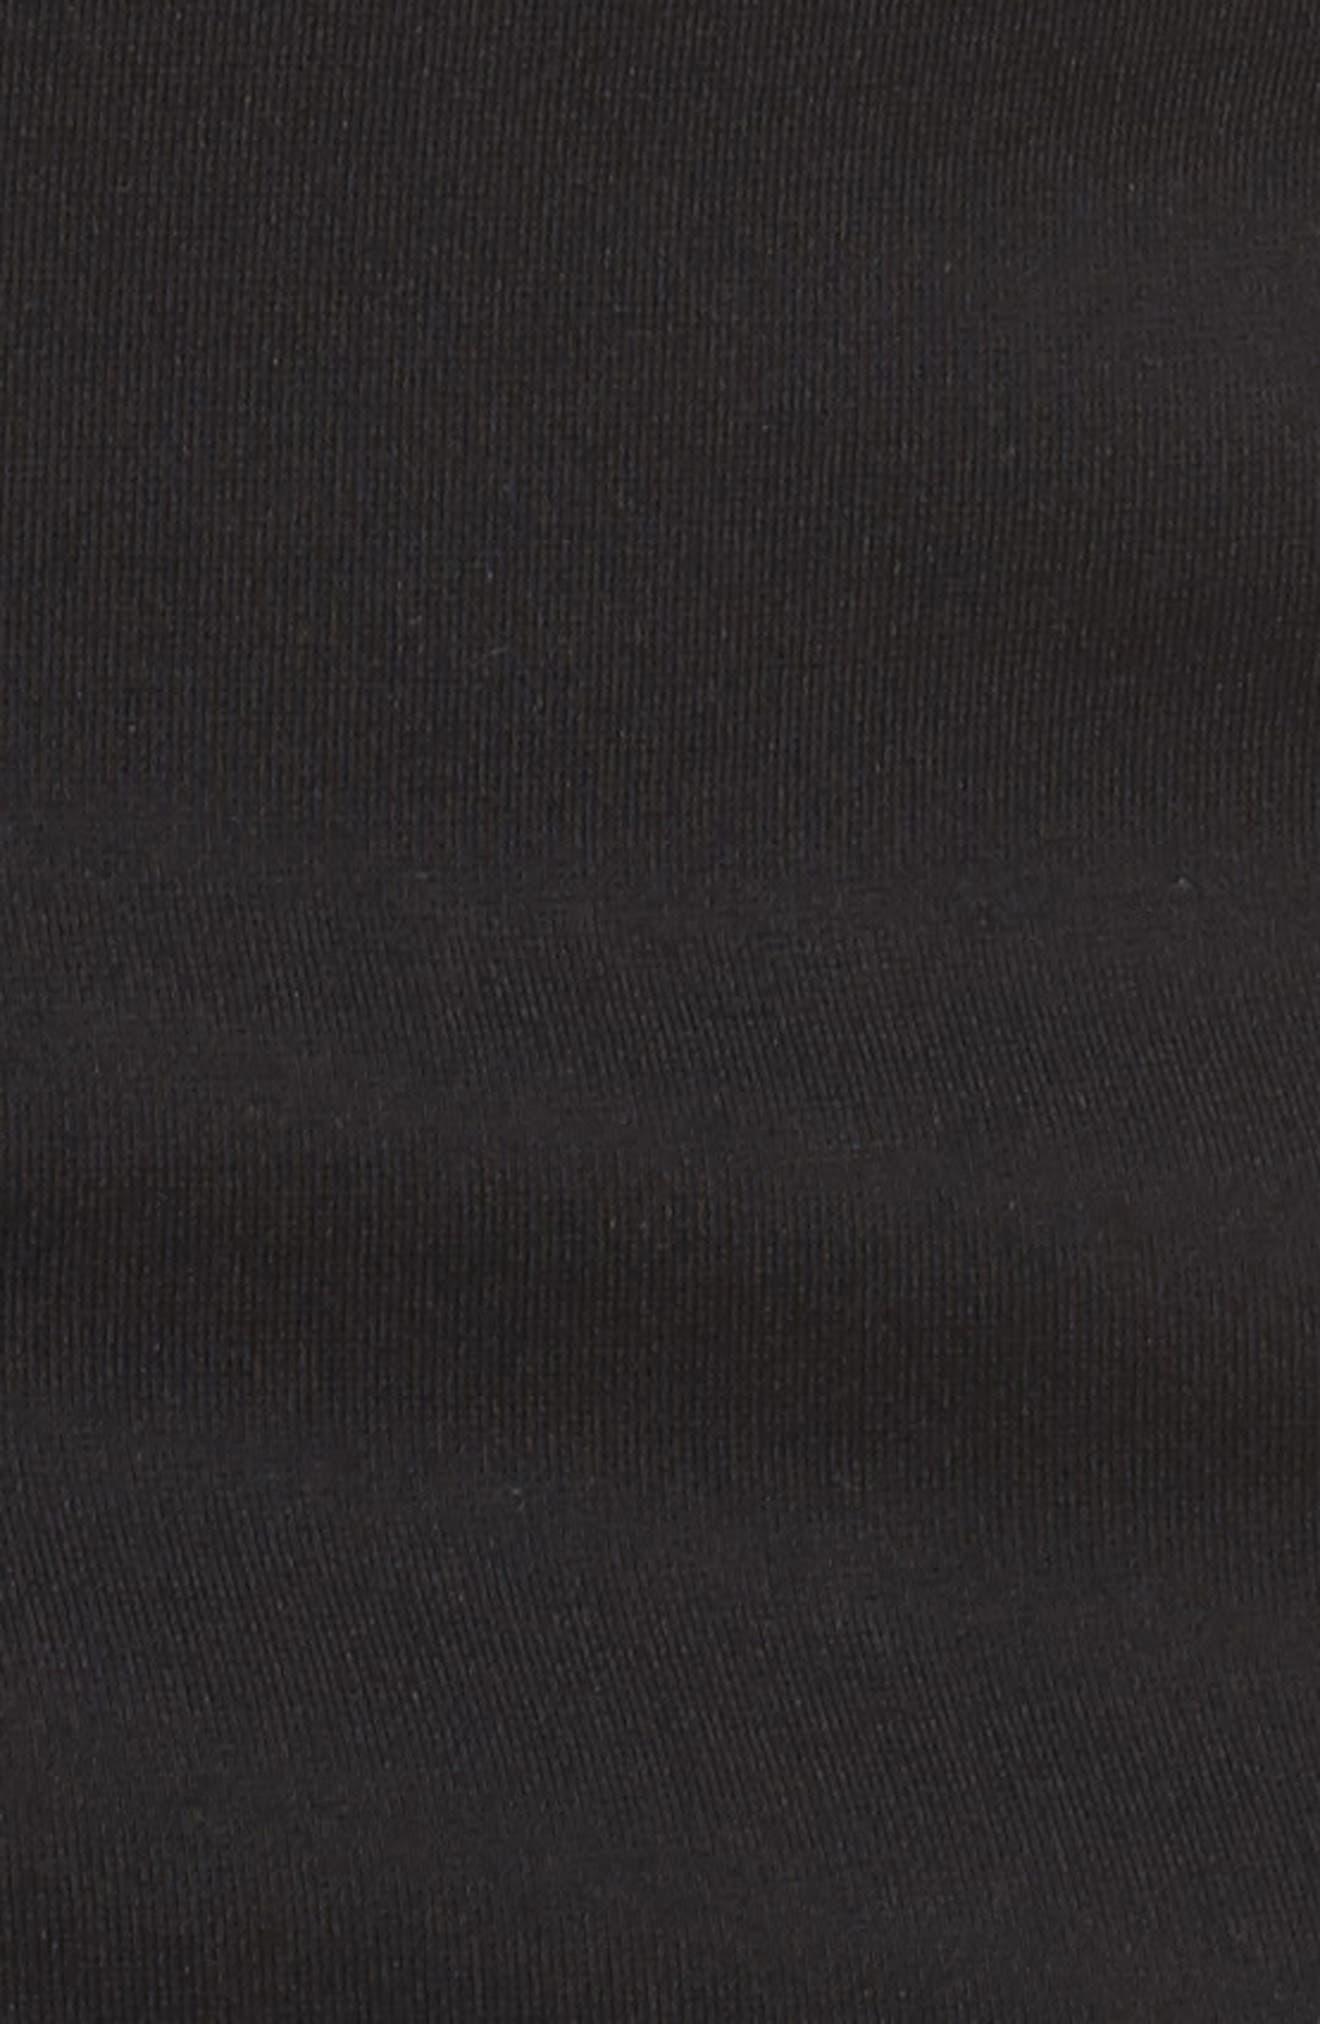 Austin Sheath Dress,                             Alternate thumbnail 5, color,                             001